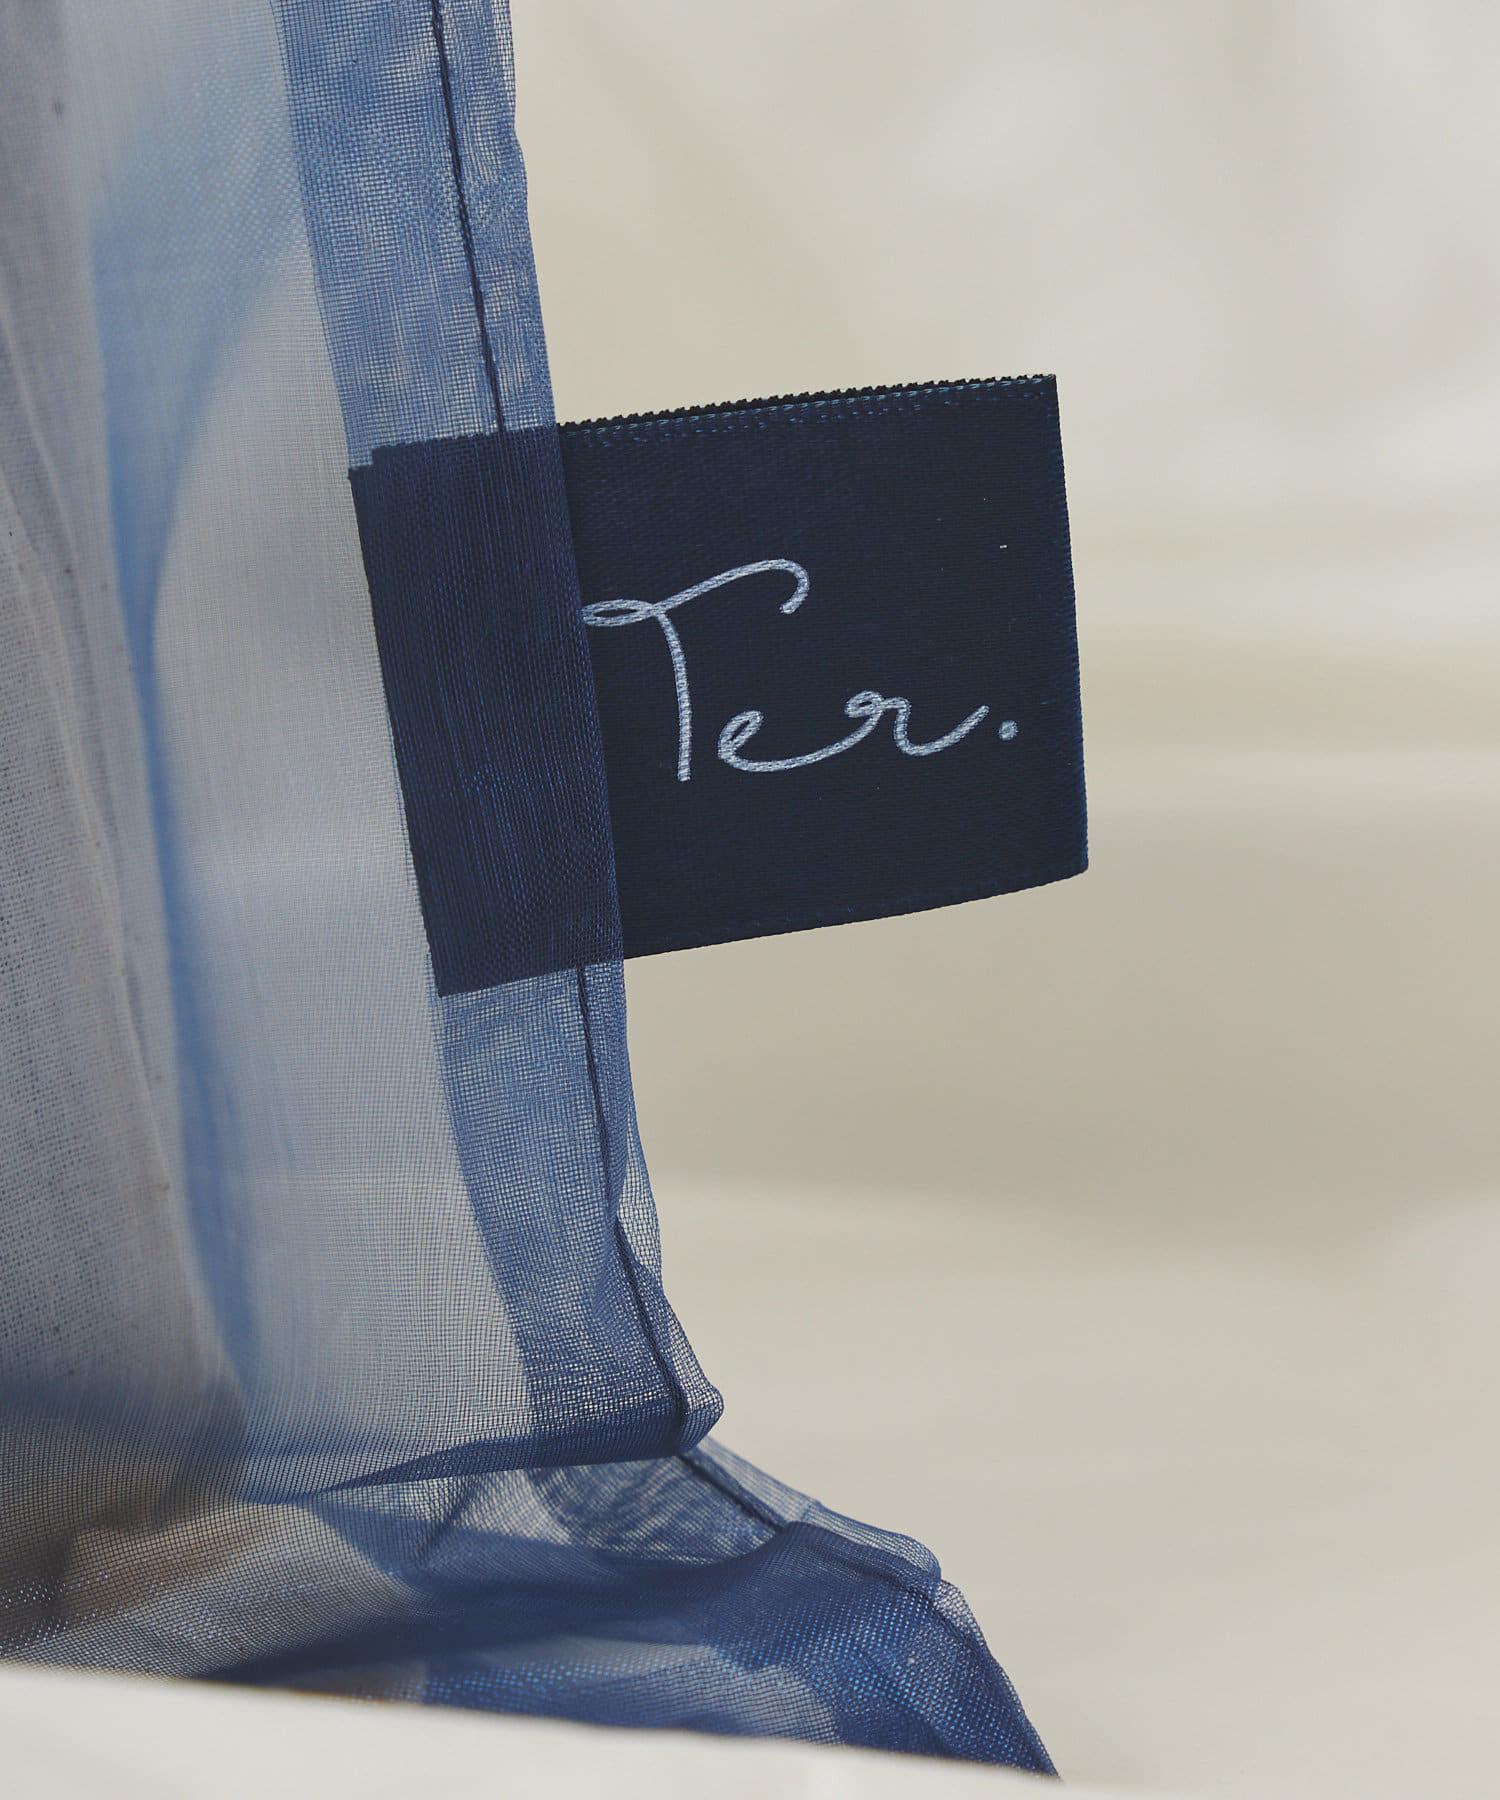 TERRITOIRE(テリトワール) 【気持ちを贈ろう】TERRITOIREオリジナル ギフトセット